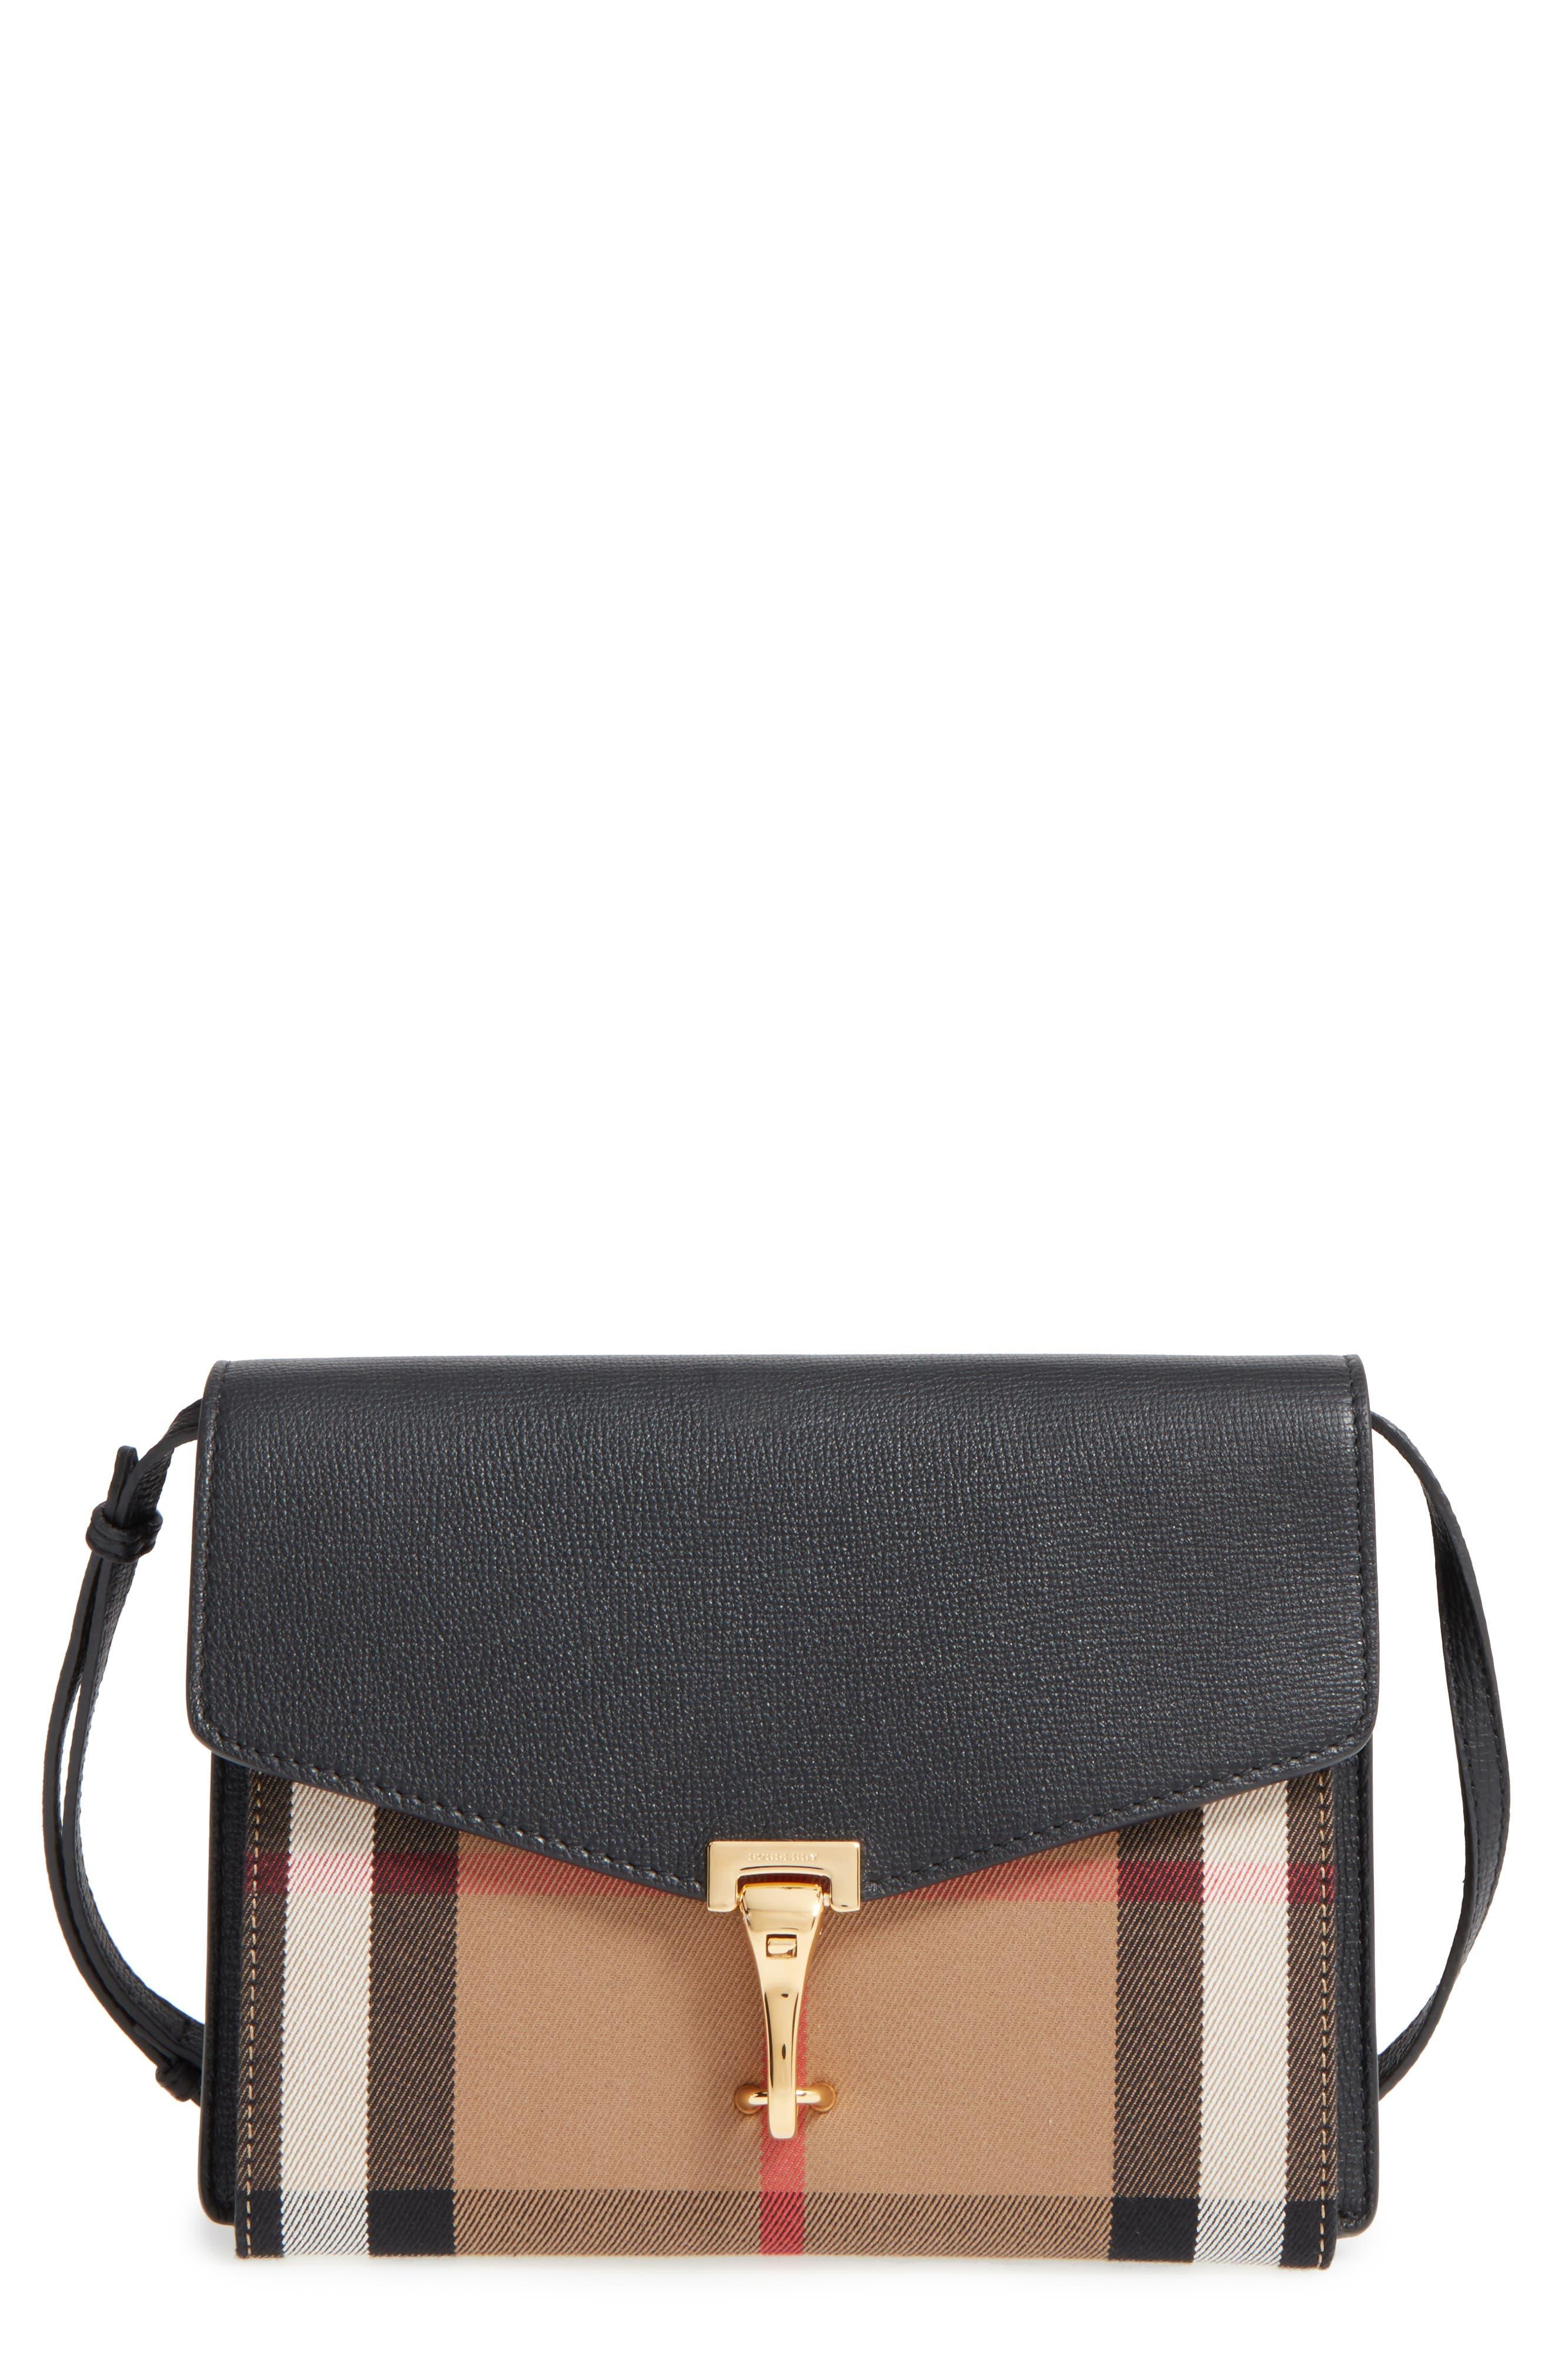 'Small Macken' Check Crossbody Bag,                         Main,                         color, BLACK